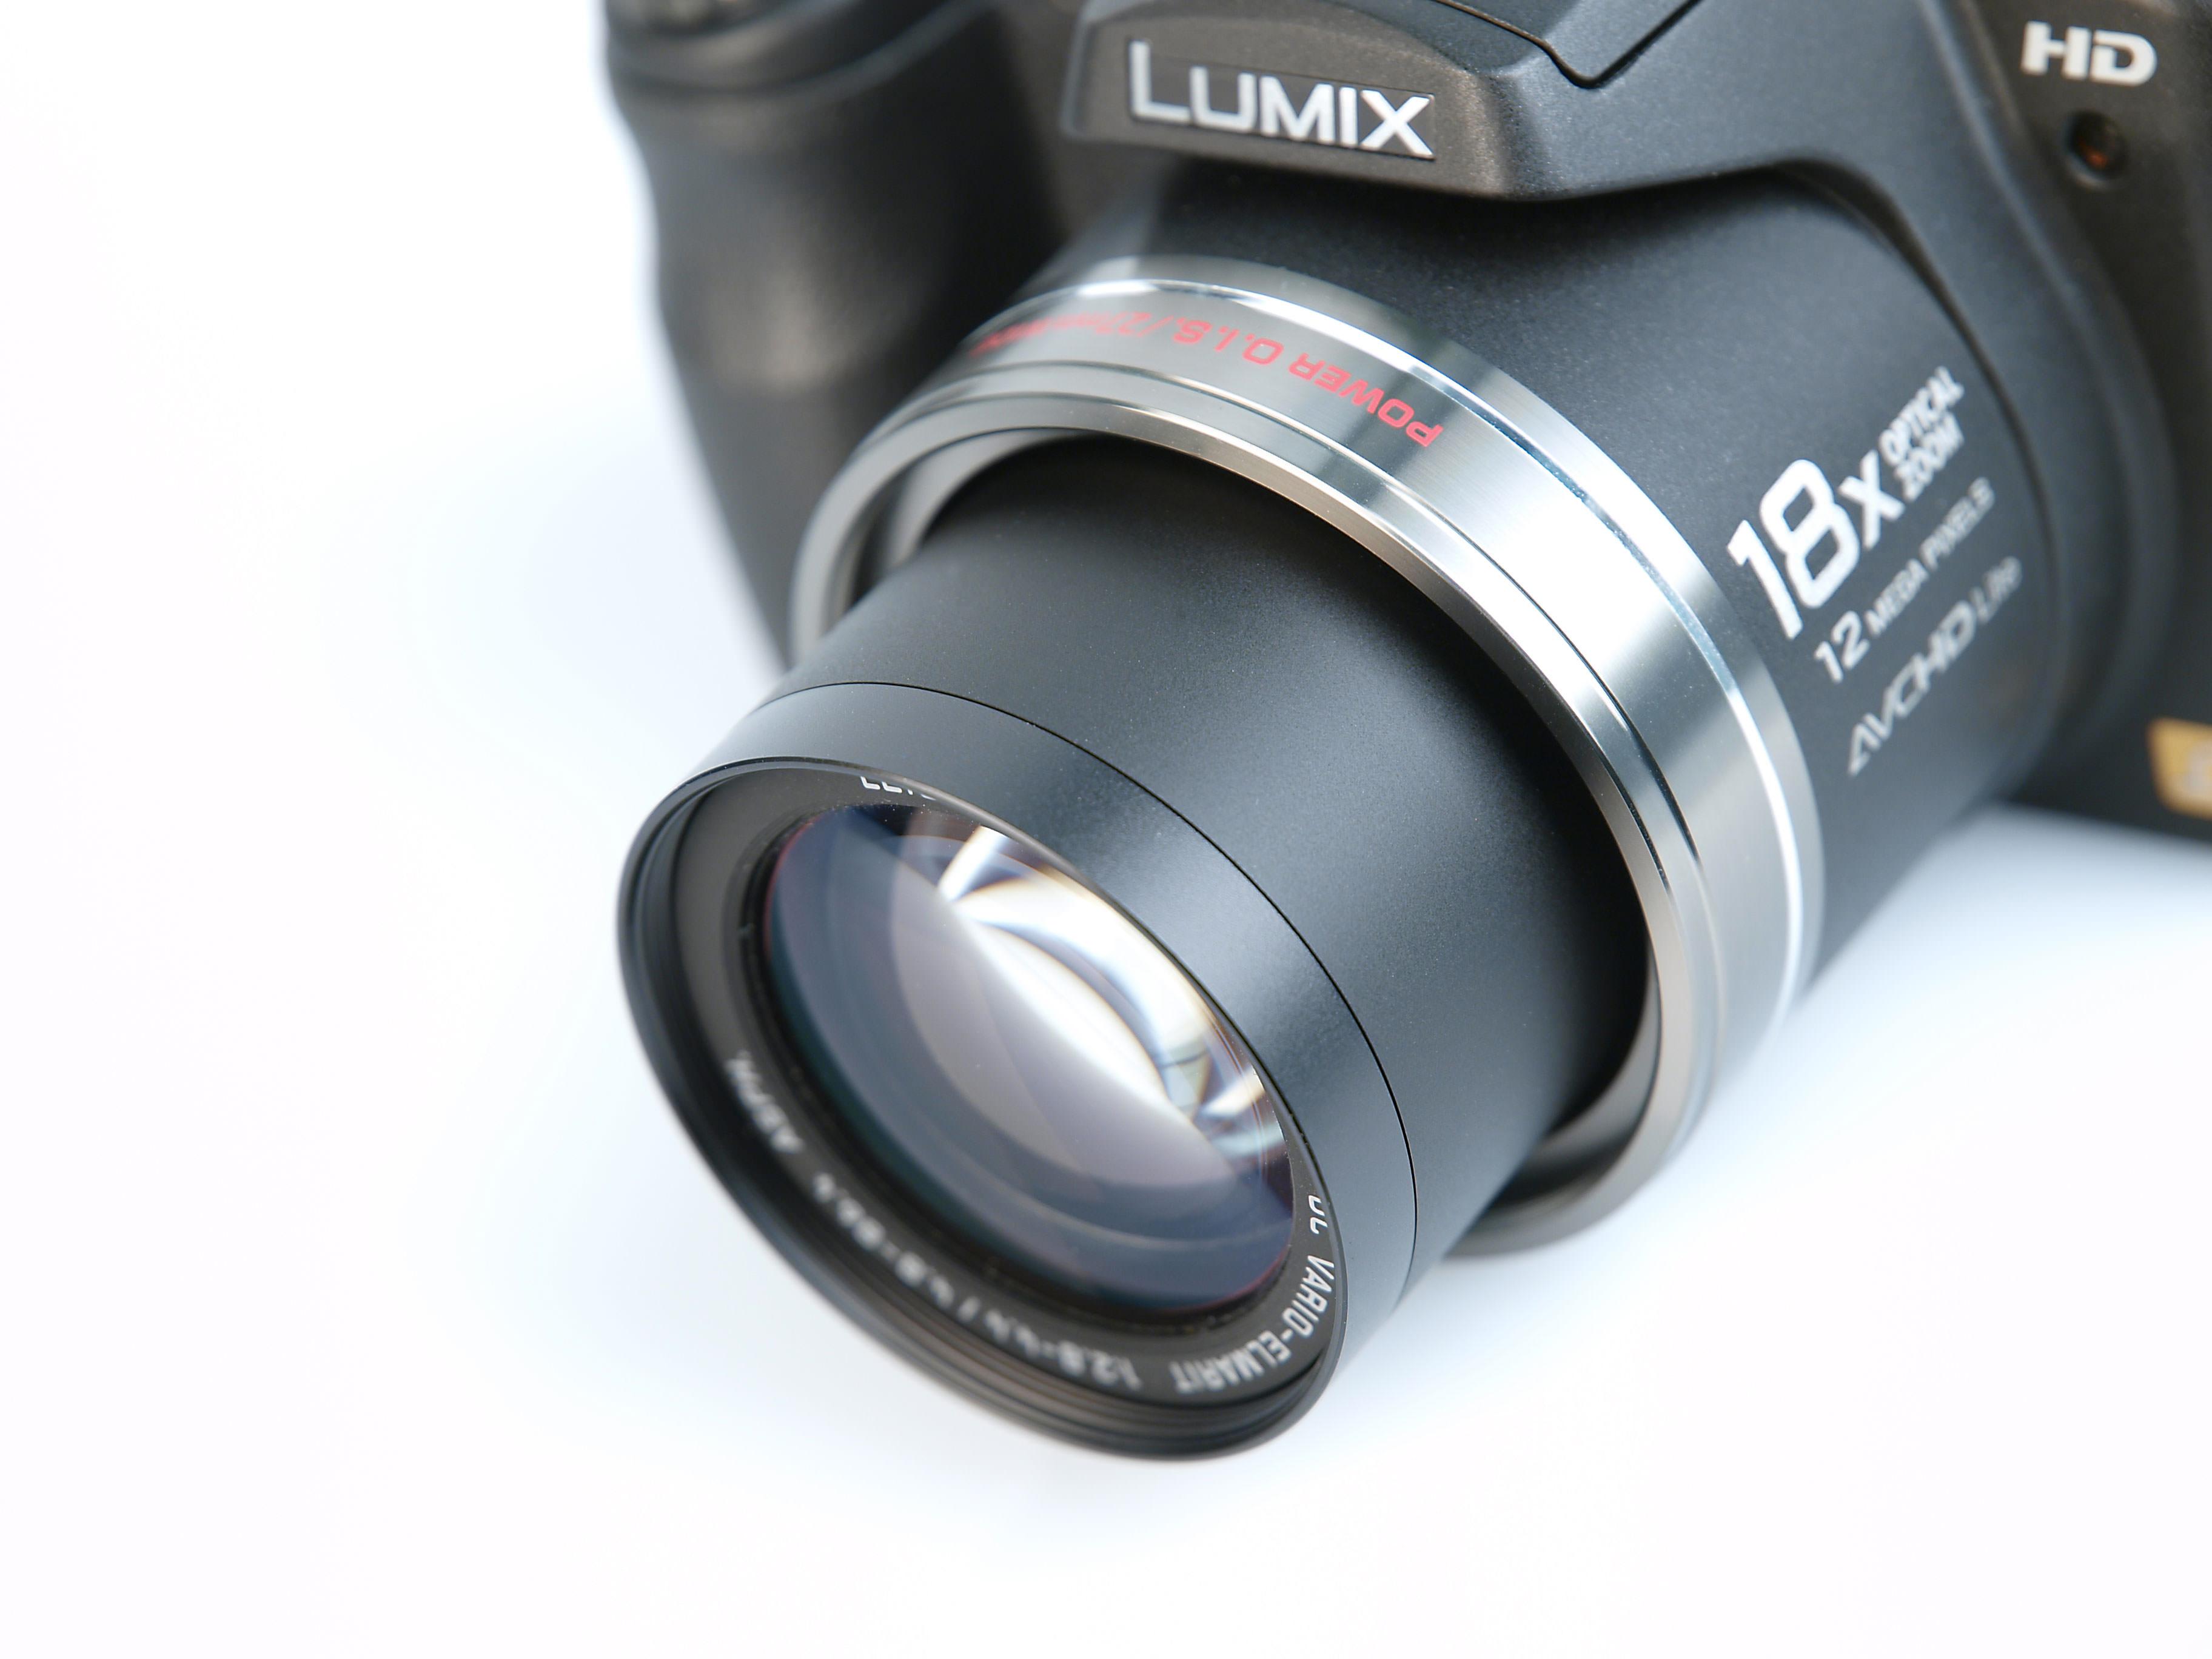 panasonic lumix dmc fz38 first look digital camera ebay. Black Bedroom Furniture Sets. Home Design Ideas